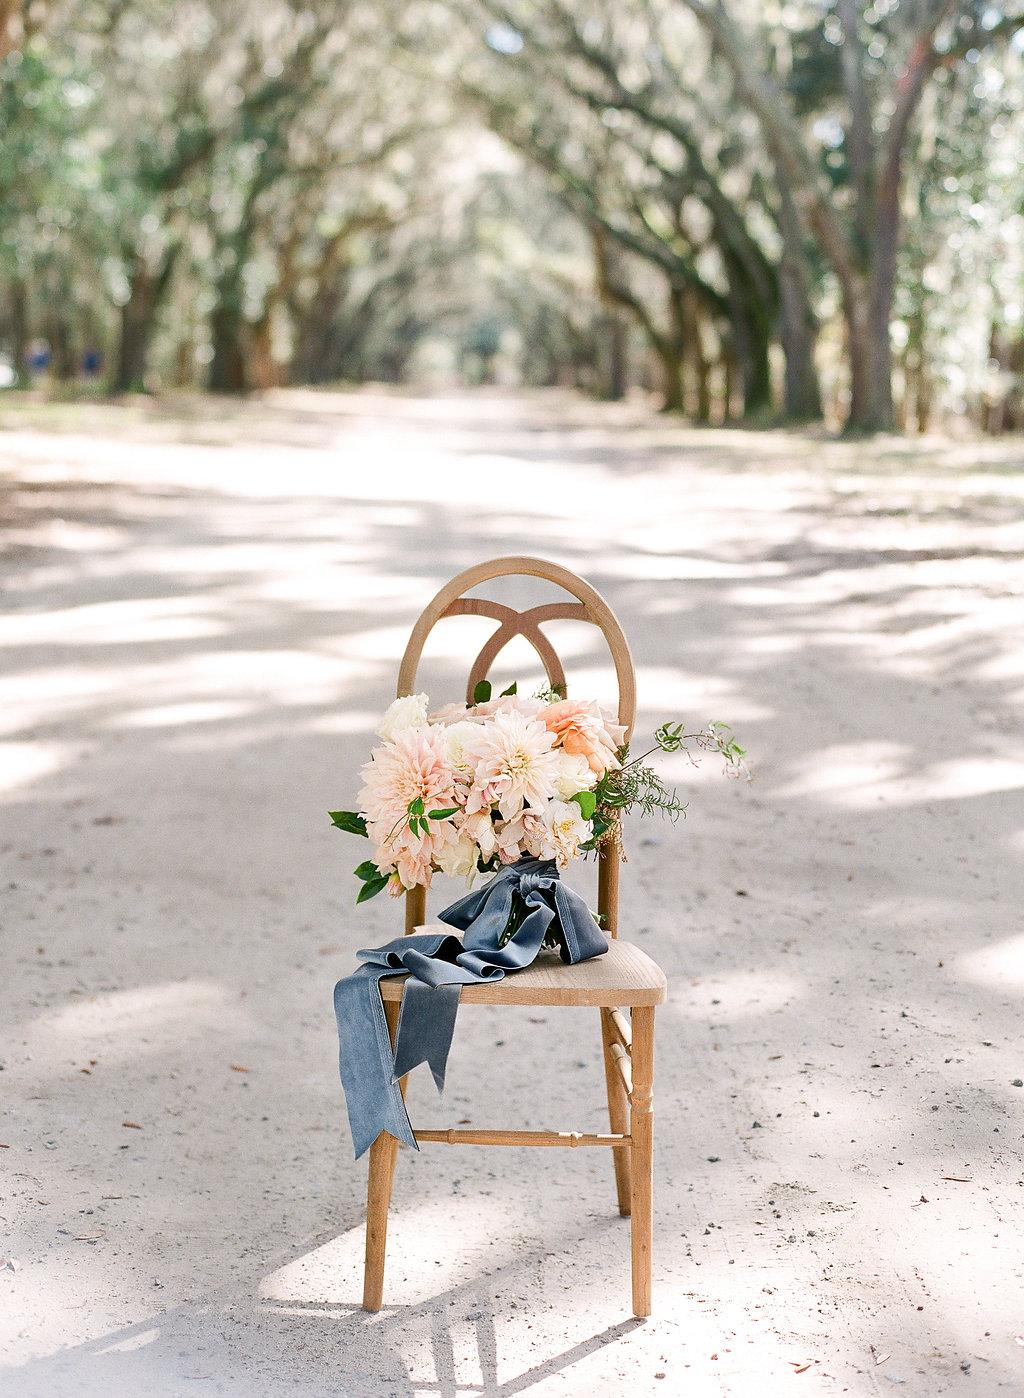 the-happy-bloom-wormsloe-wedding-savannah-wedding-ivory-and-beau-bridal-boutique-savannah-wedding-dresses-savannah-bridal-boutique-georgia-bridal-boutique-design-studio-south-sunset-wedding-blush-by-hayley-paige-candi-1550-blush-wedding-dress-6.jpg